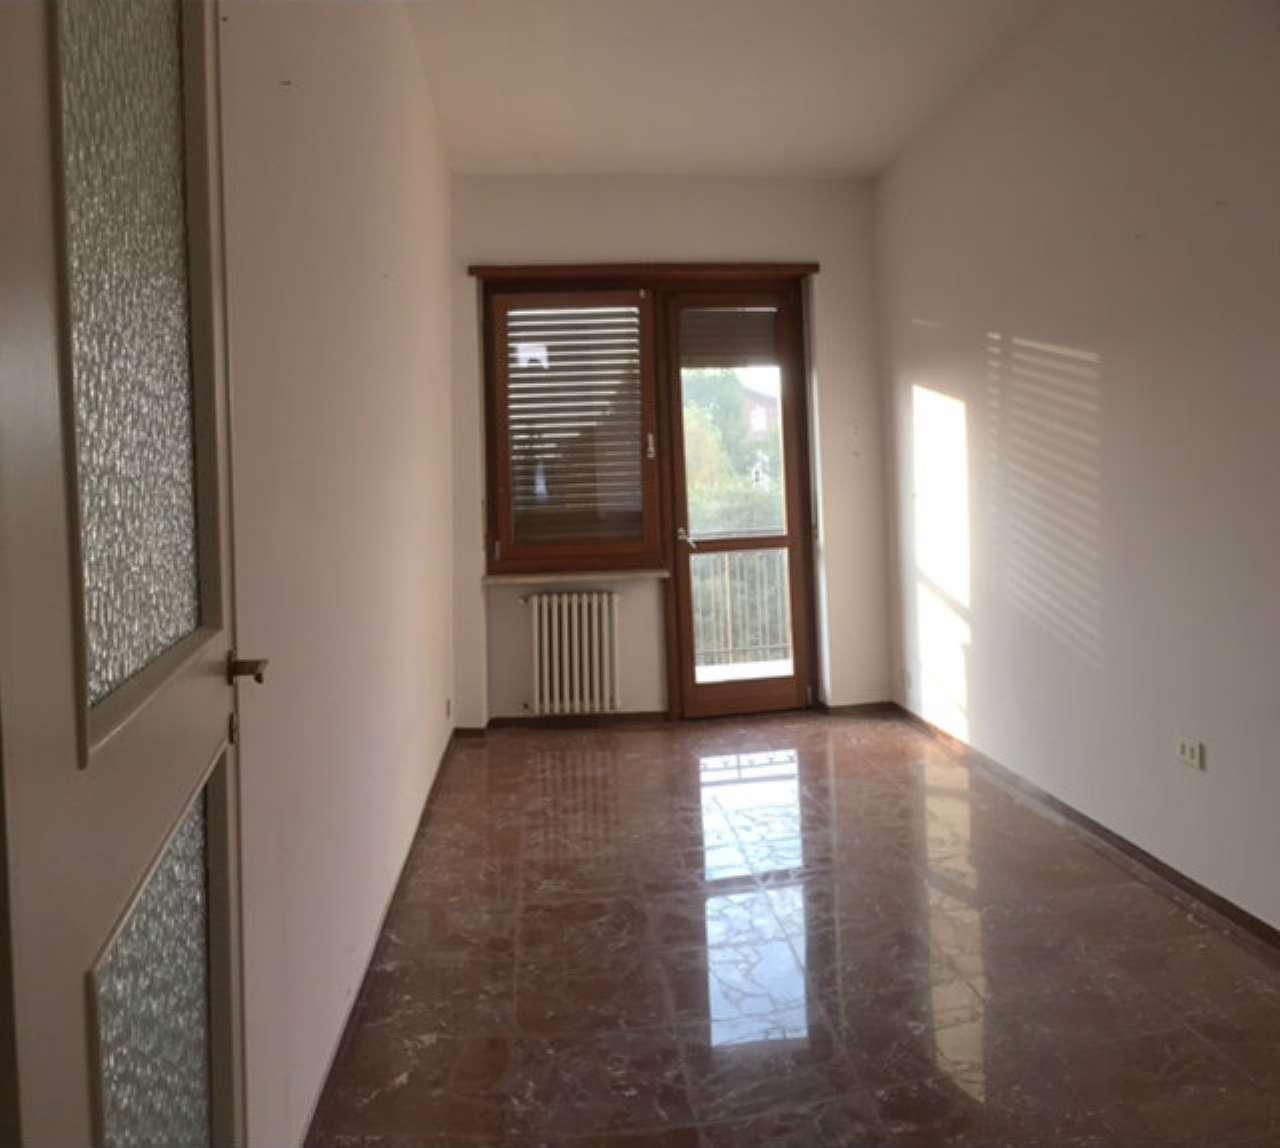 Foto 5 di Appartamento via Arnaldo da Brescia, Torino (zona Lingotto)